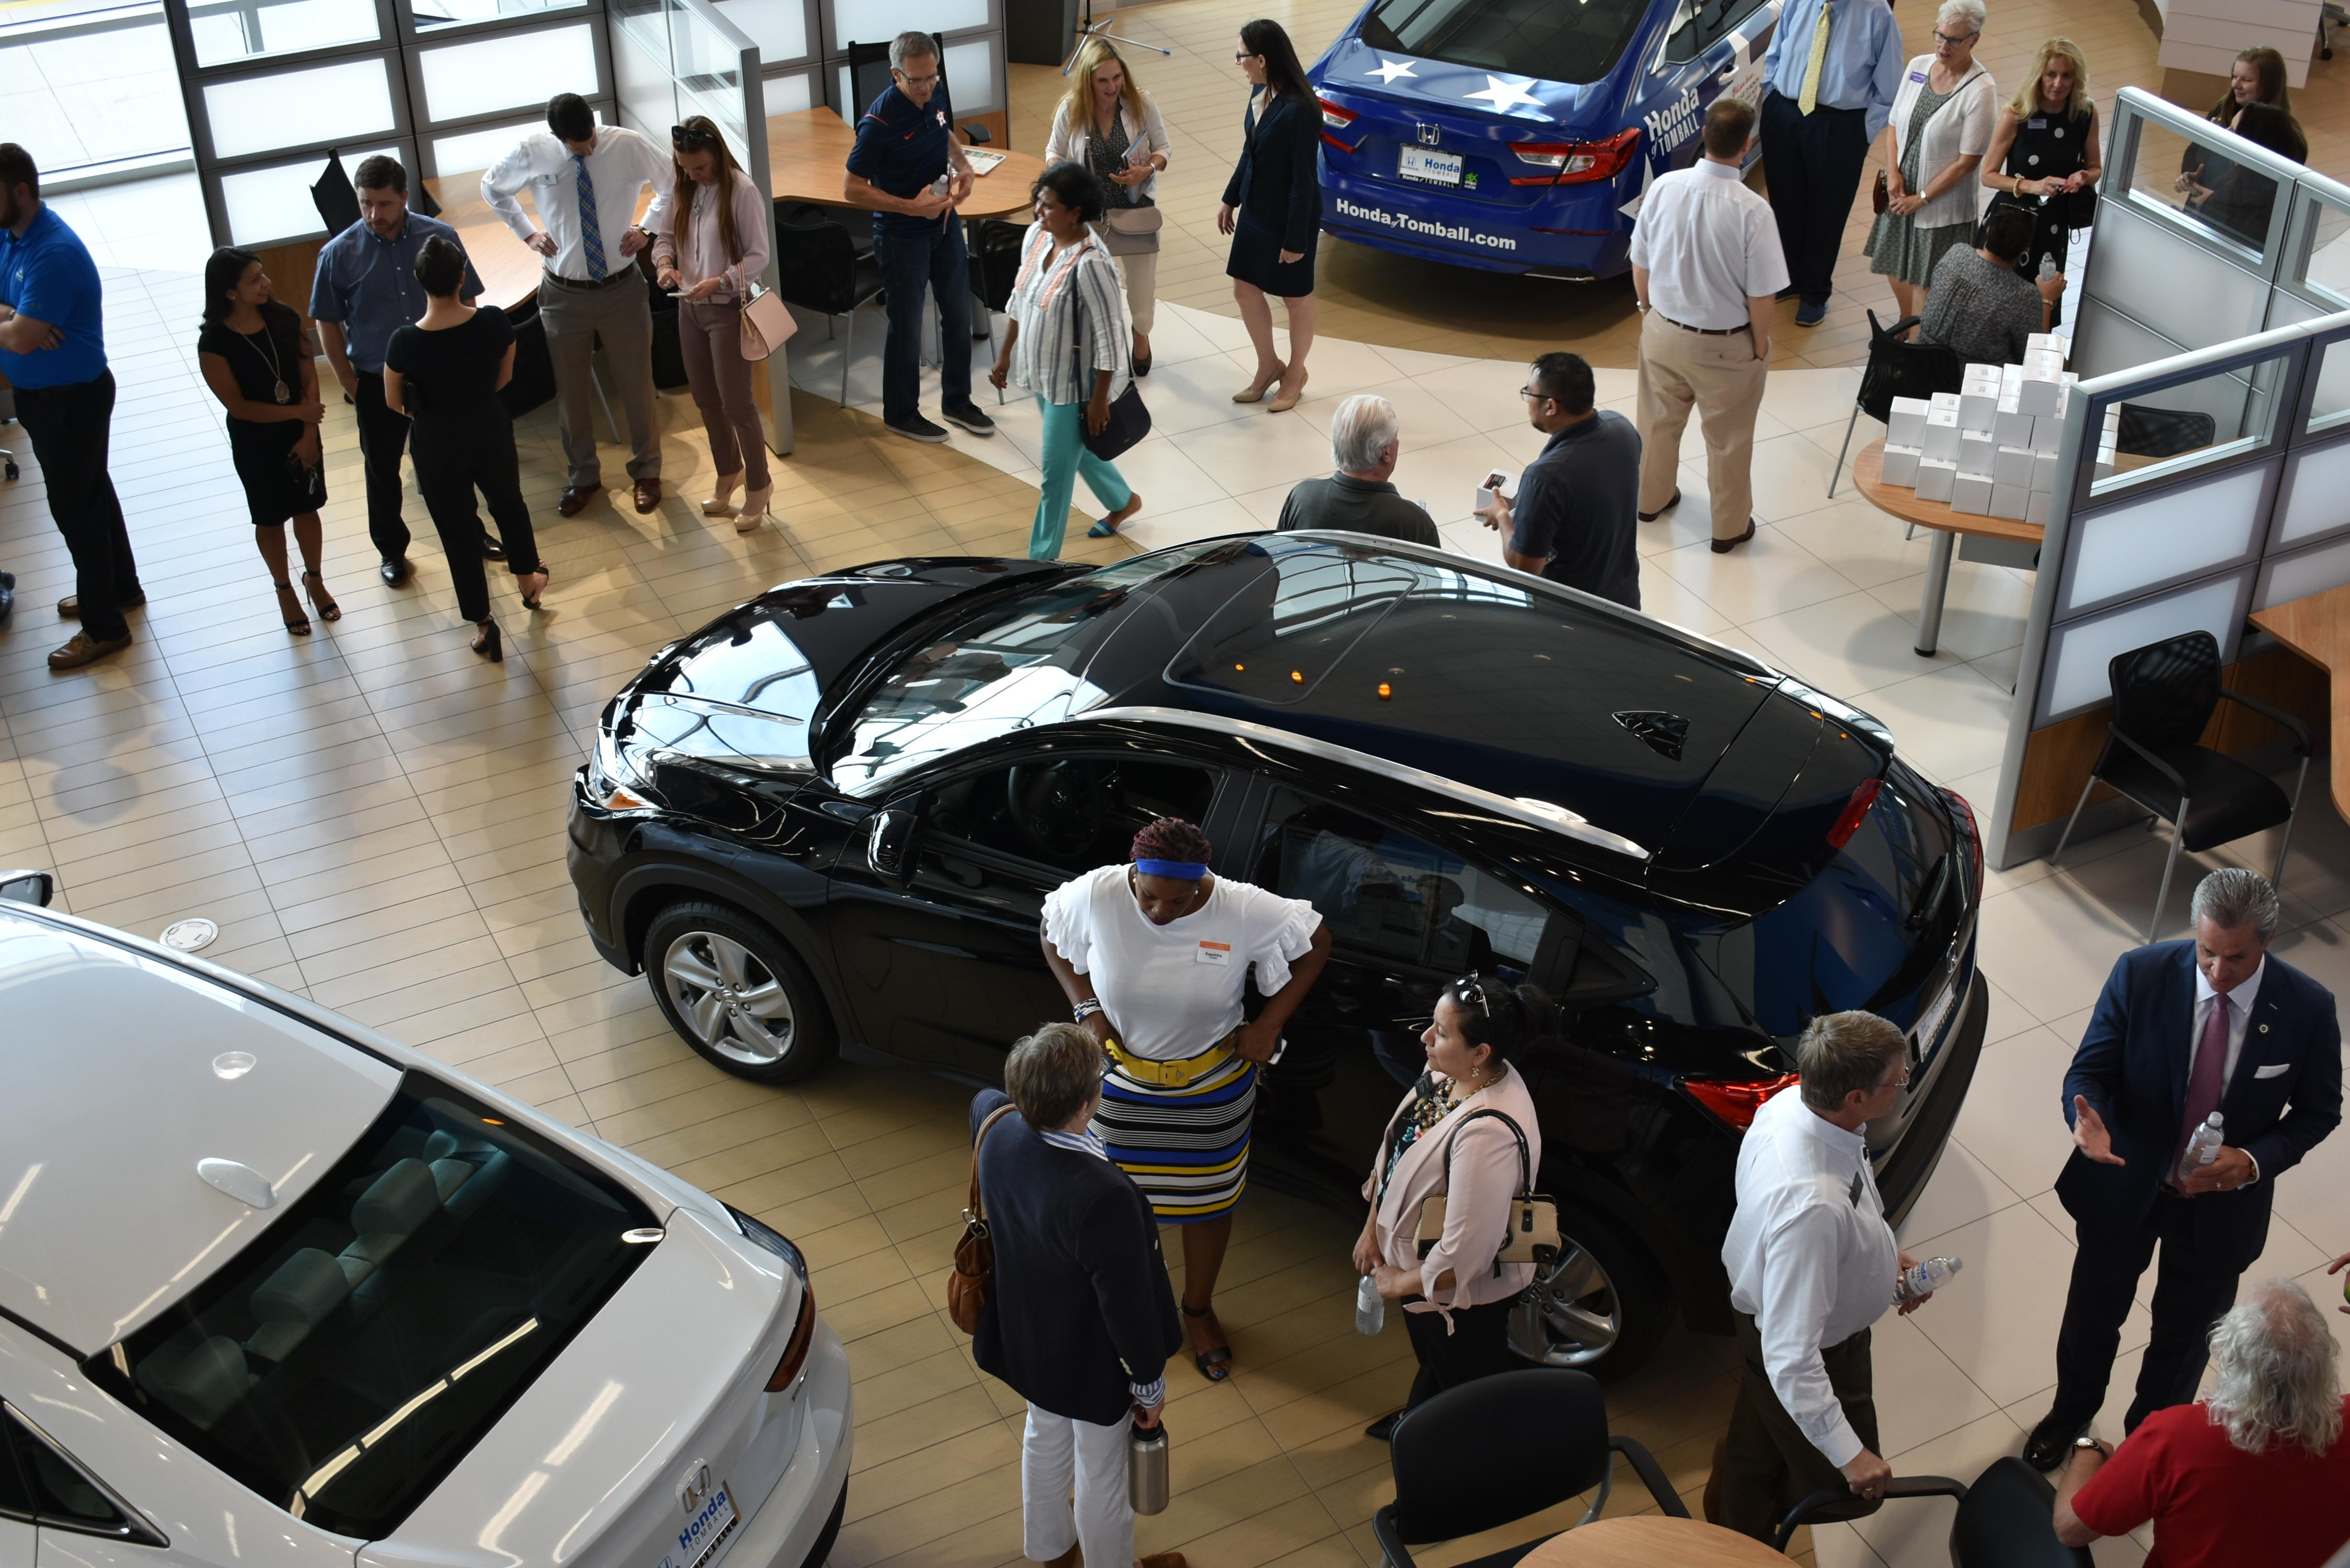 Honda of Tomball Grand Opening – Ariel View